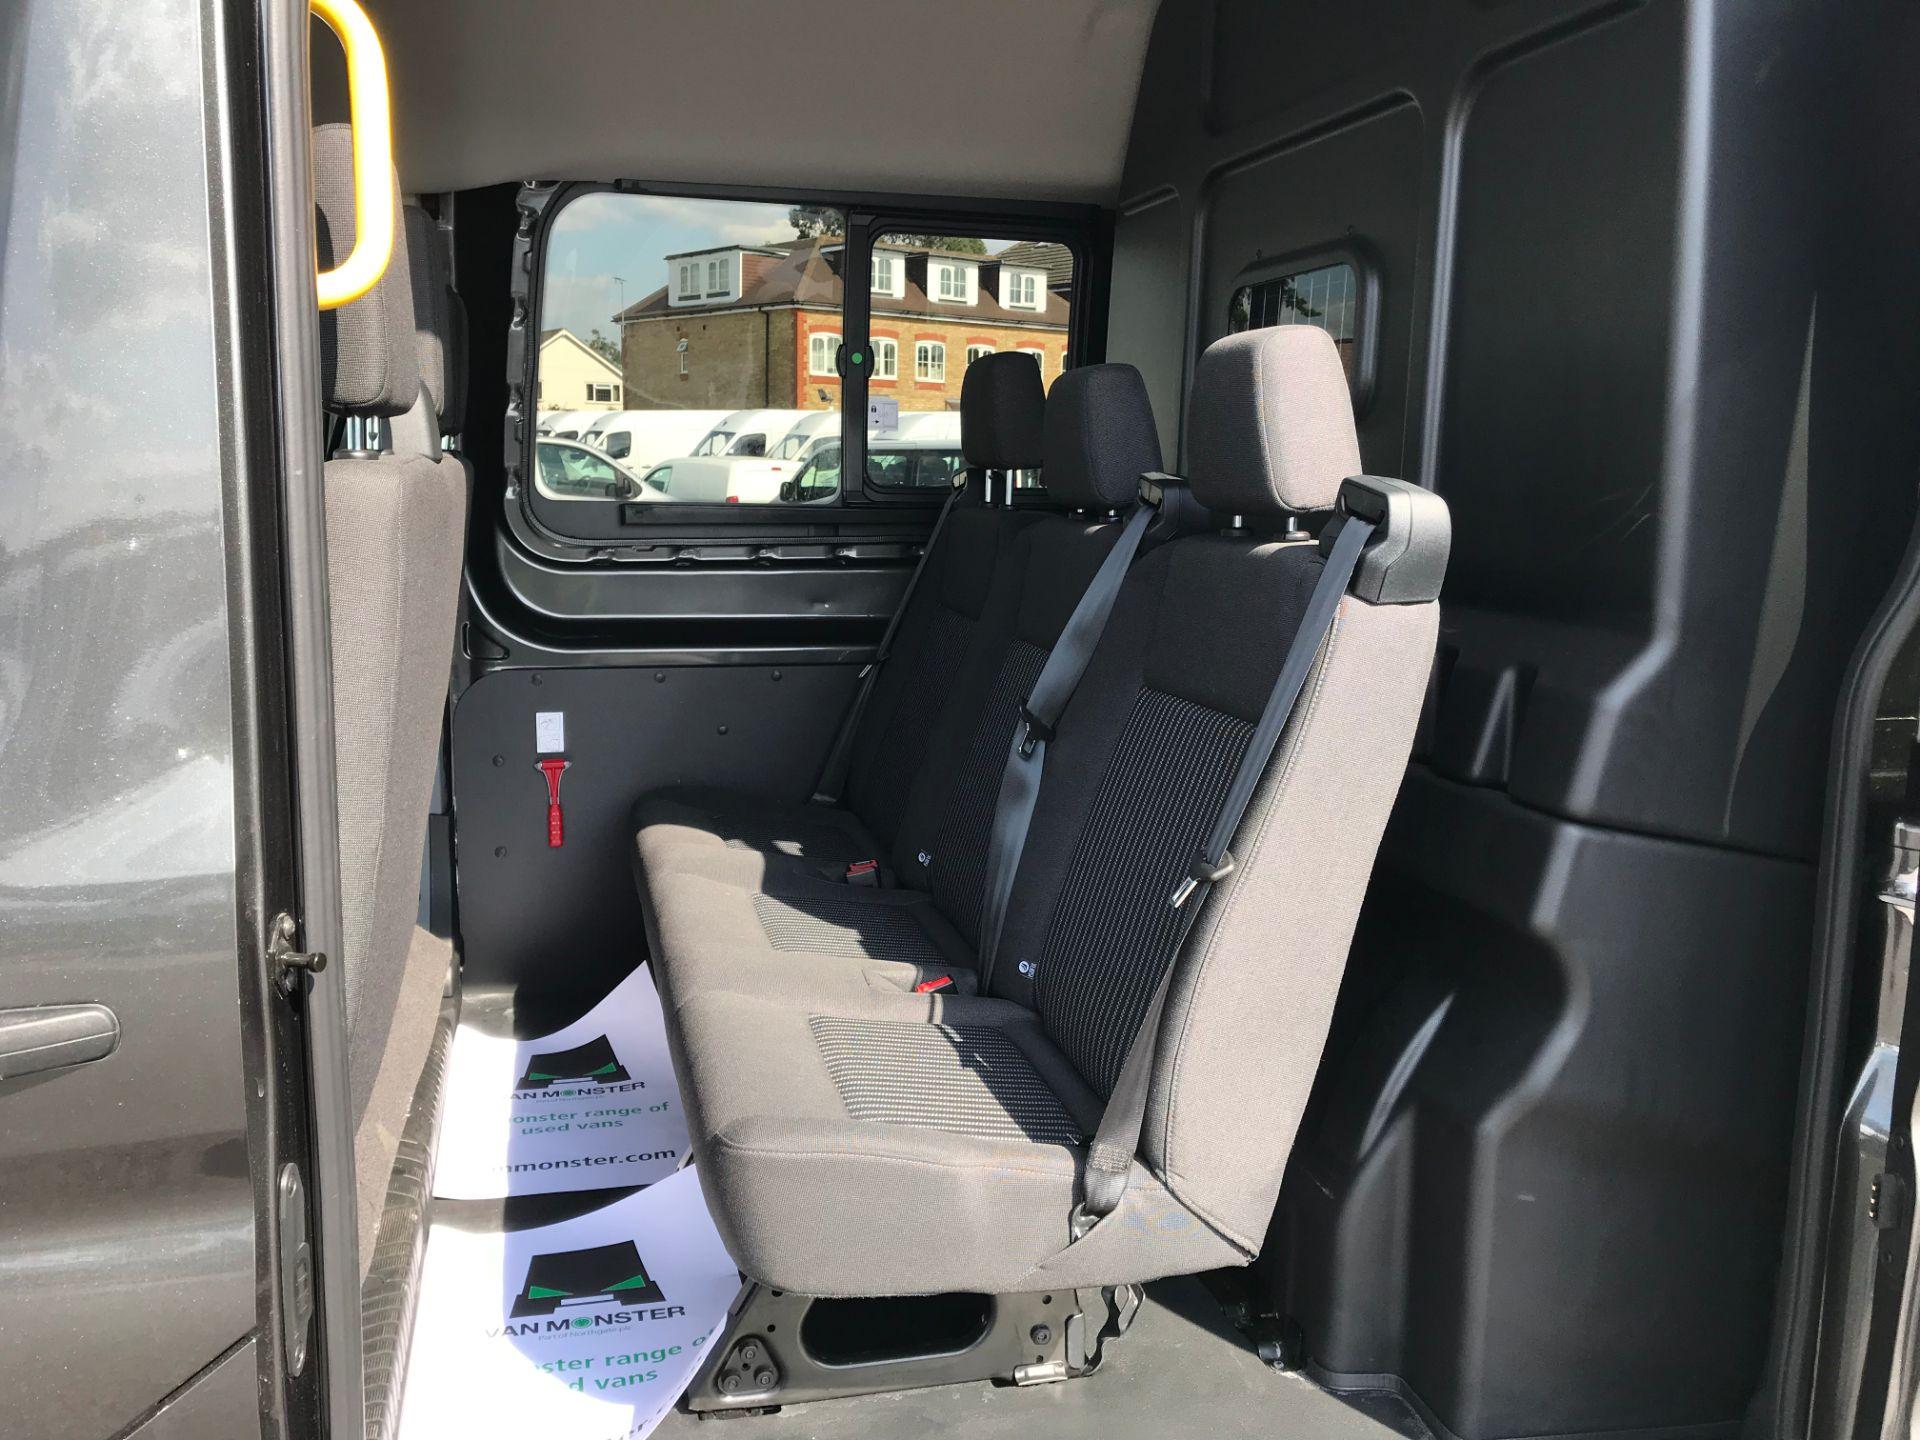 2018 Ford Transit 2.0 TDCi 130ps H2 D/Cab Trend Van Auto (WP68WHL) Image 16